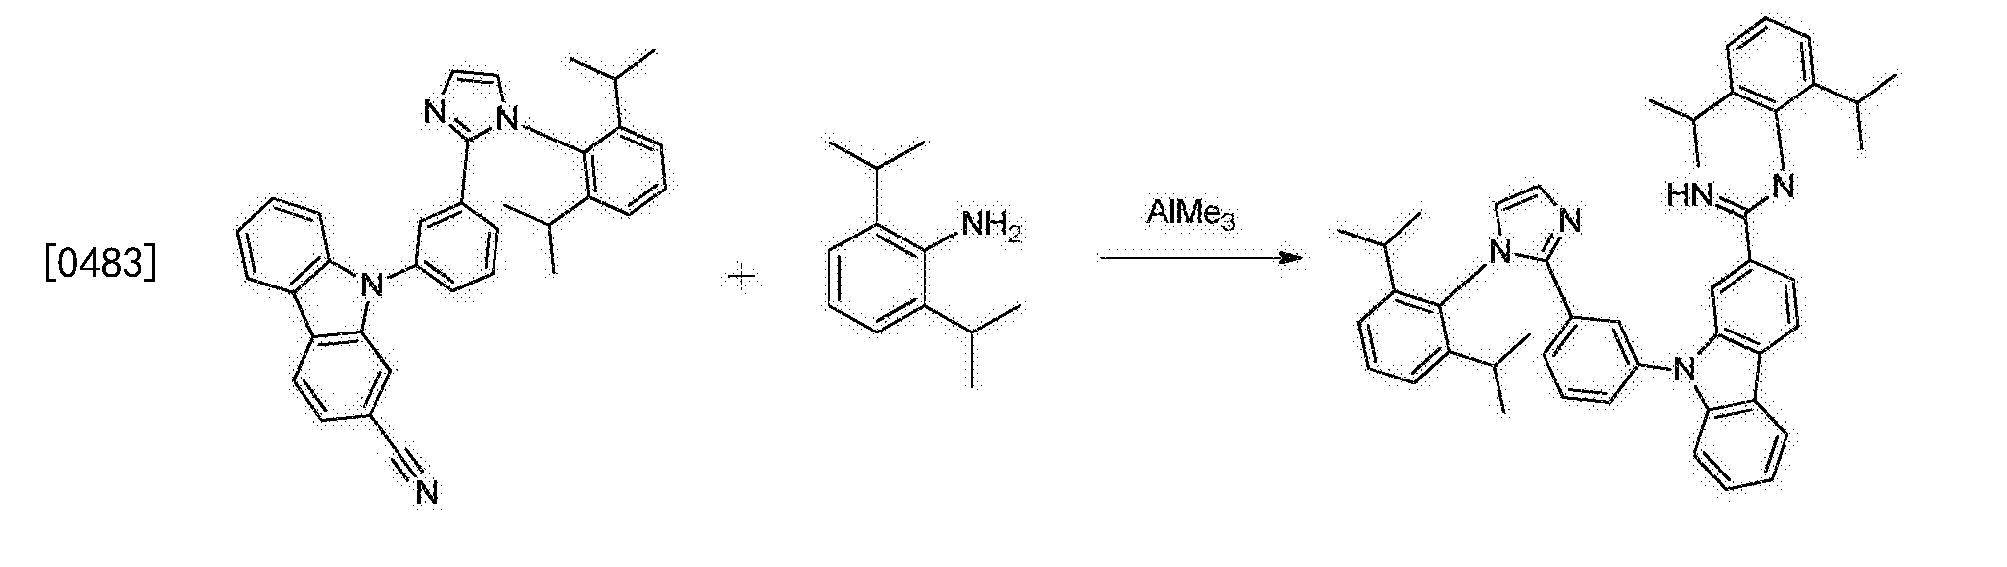 Figure CN106749425AD01483